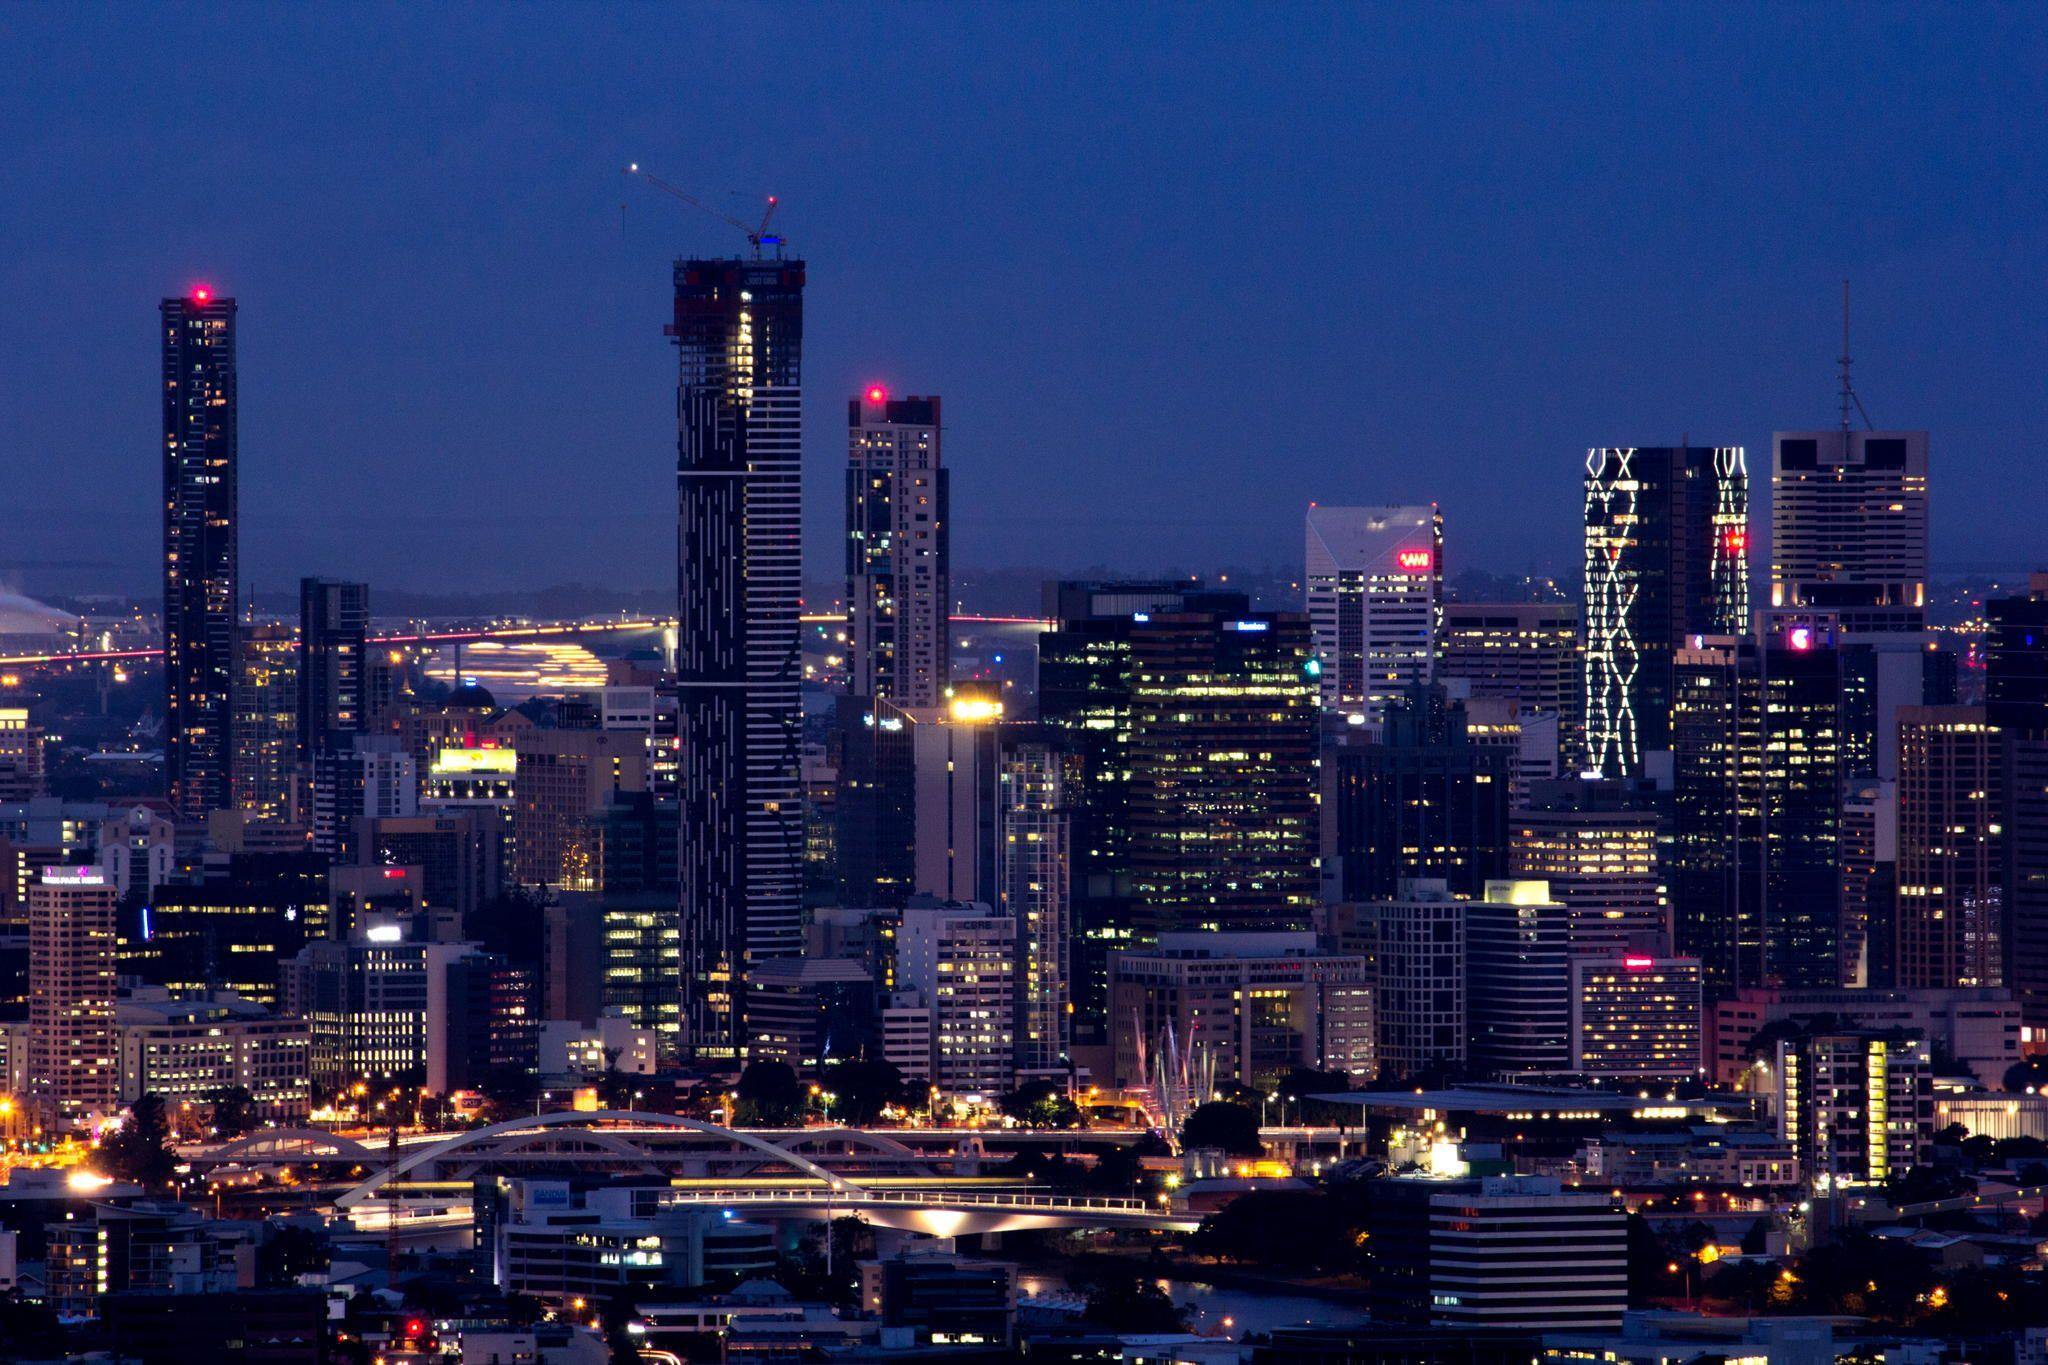 Brisbane Skyline - View of Brisbane City from Mt Coot-tha